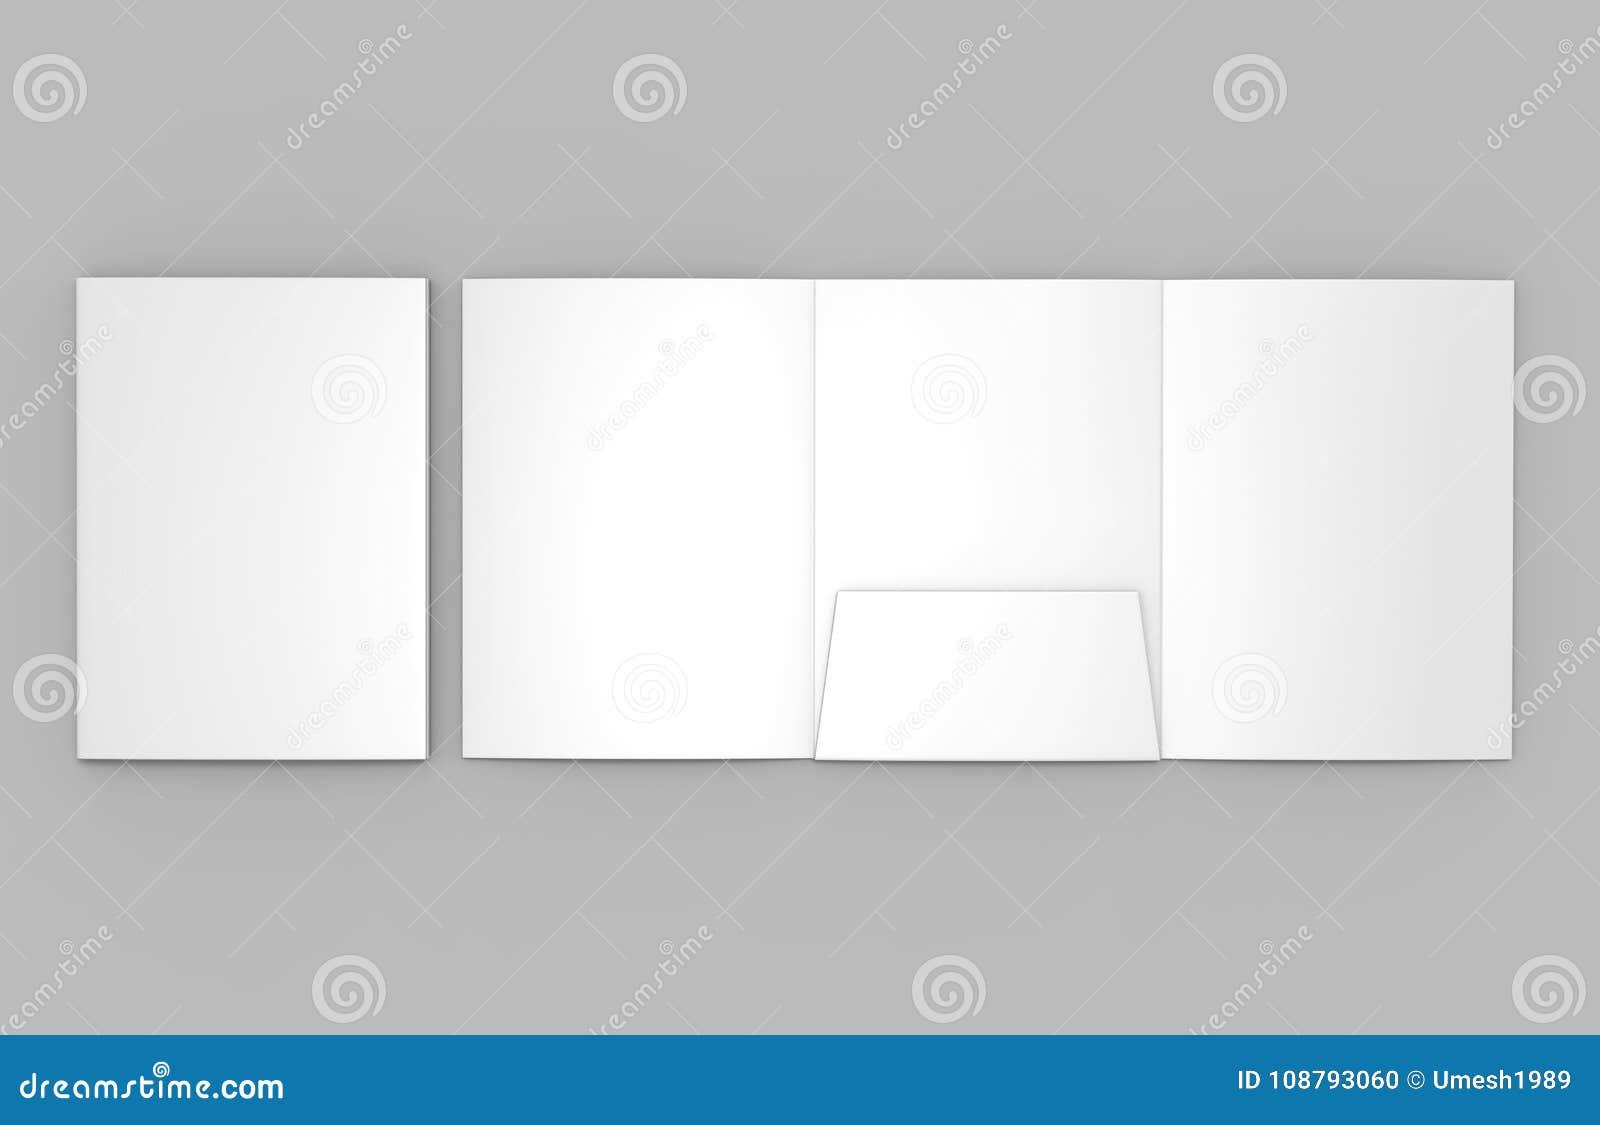 Tri-fold Blank white reinforced A4 single pocket folder catalog on grey background for mock up. 3D rendering.